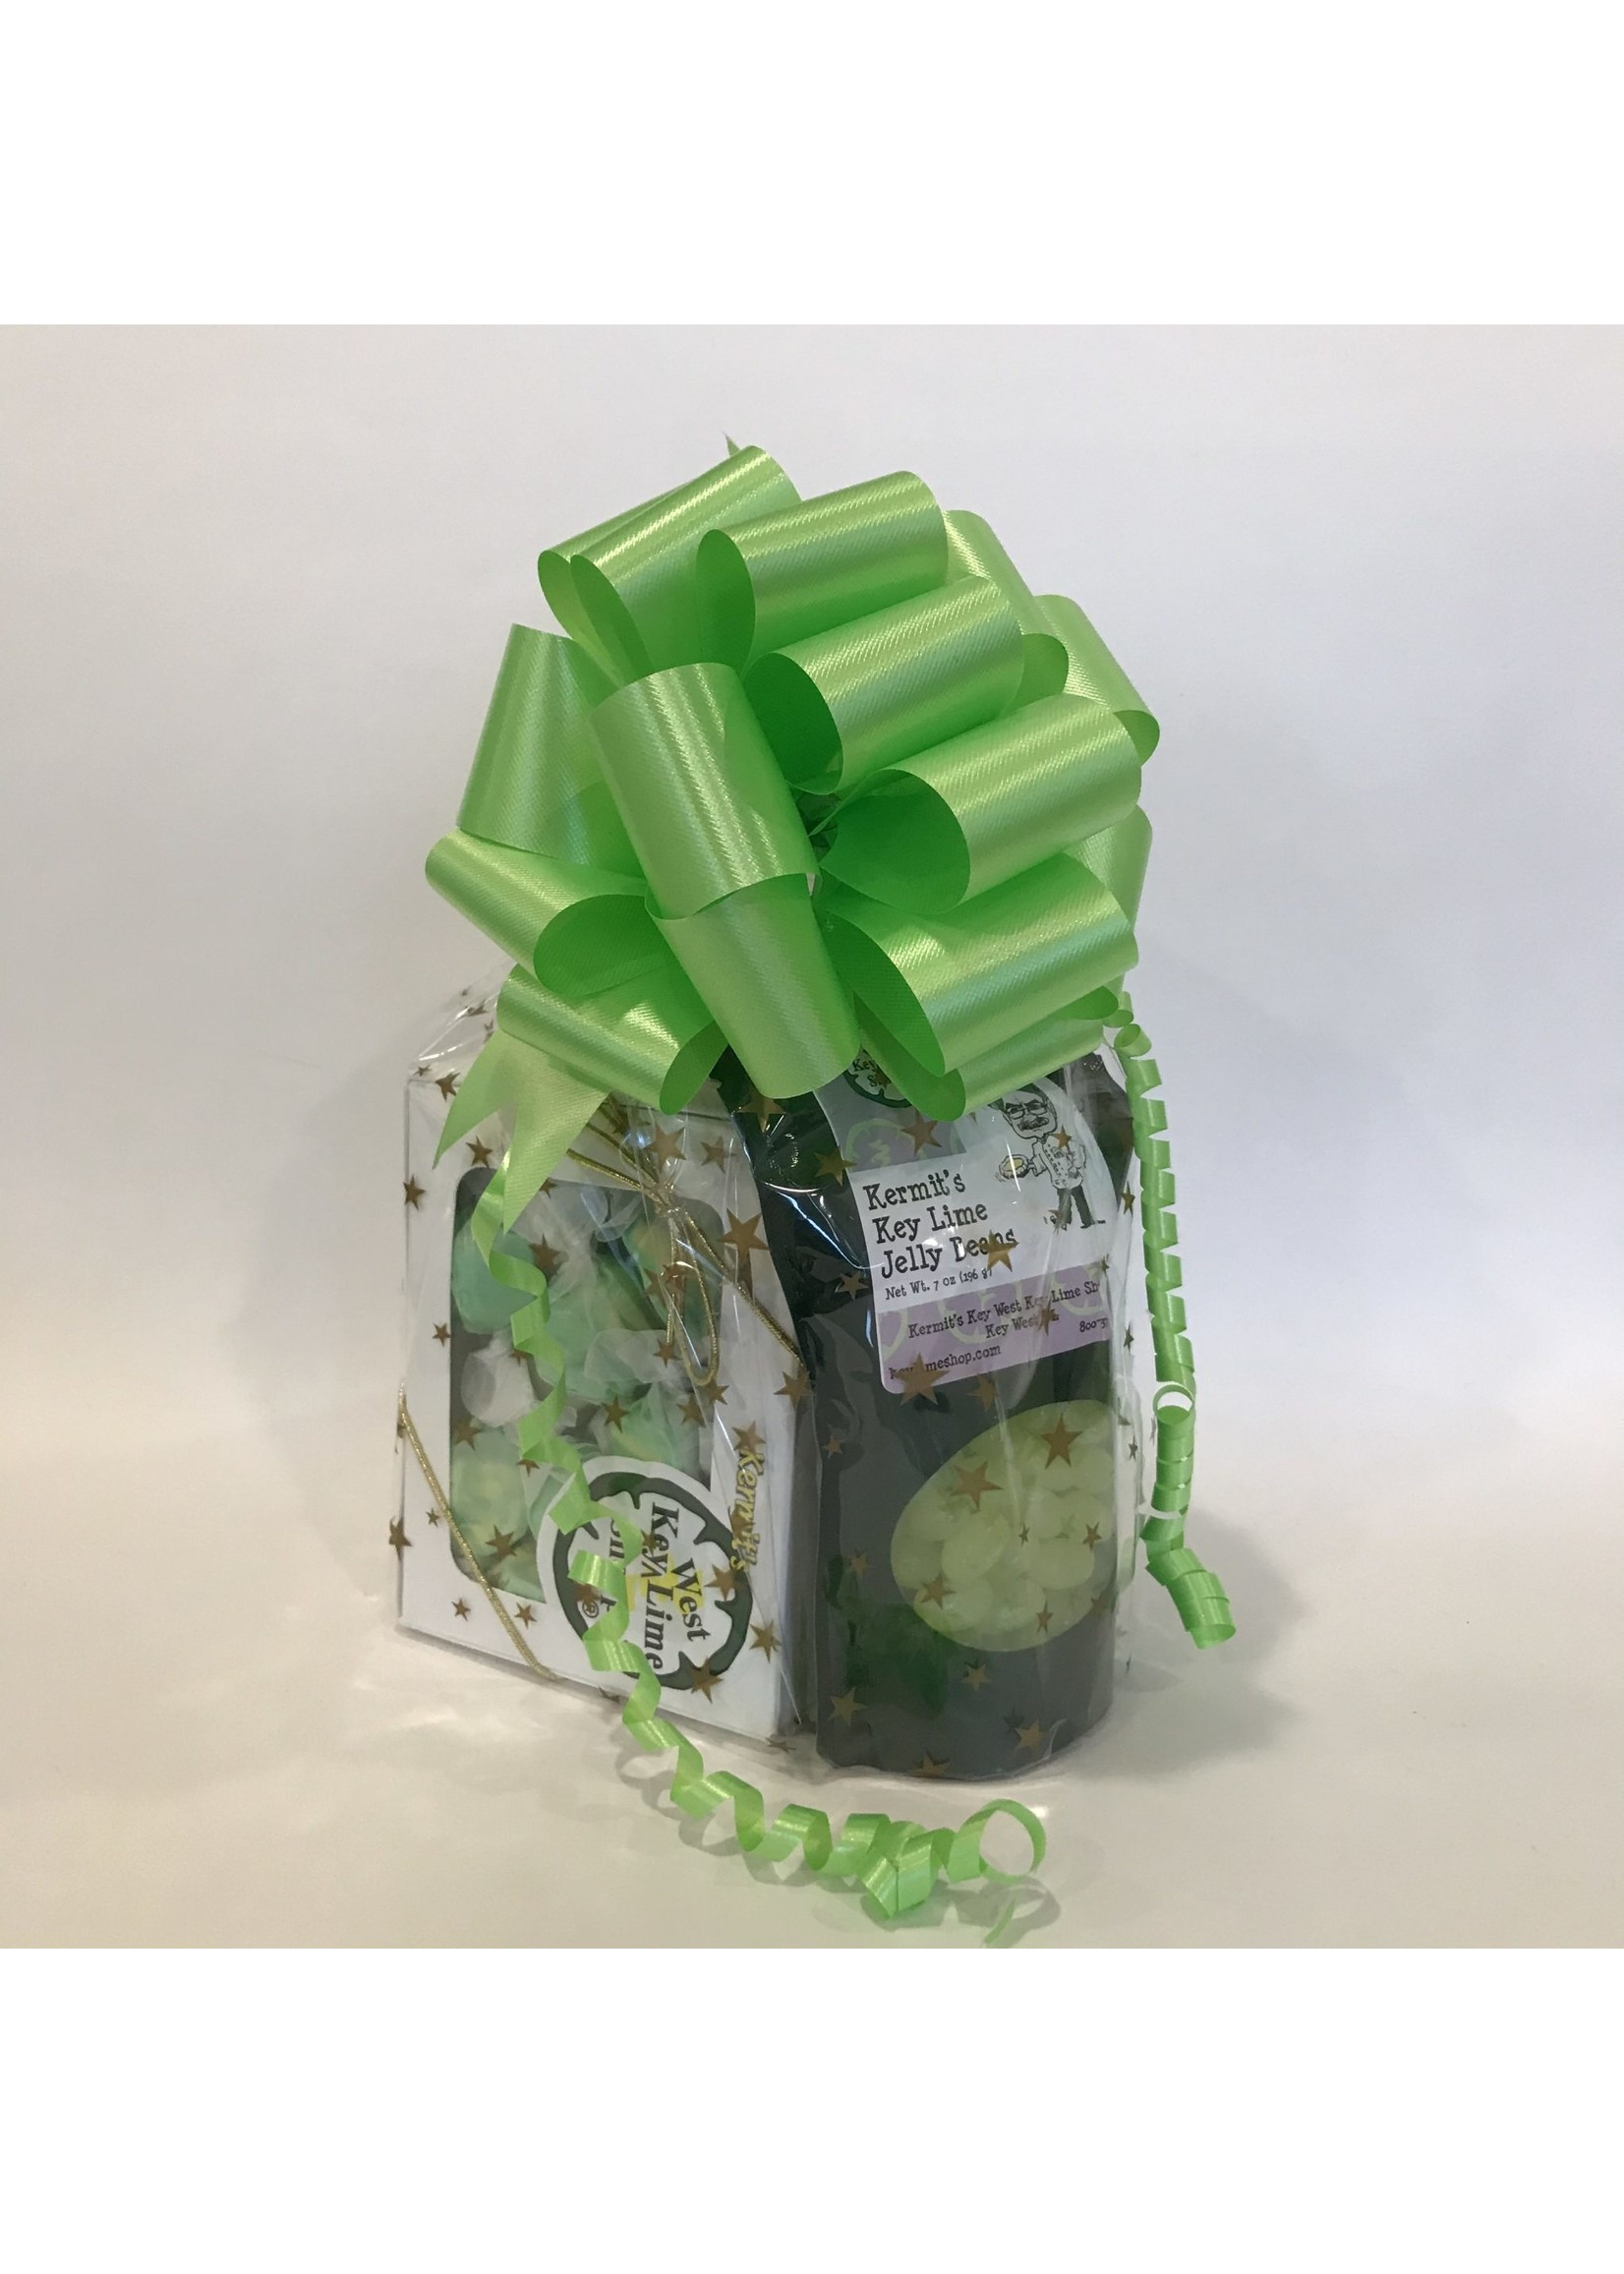 Kermit's Sunset Sweet Gift Bag